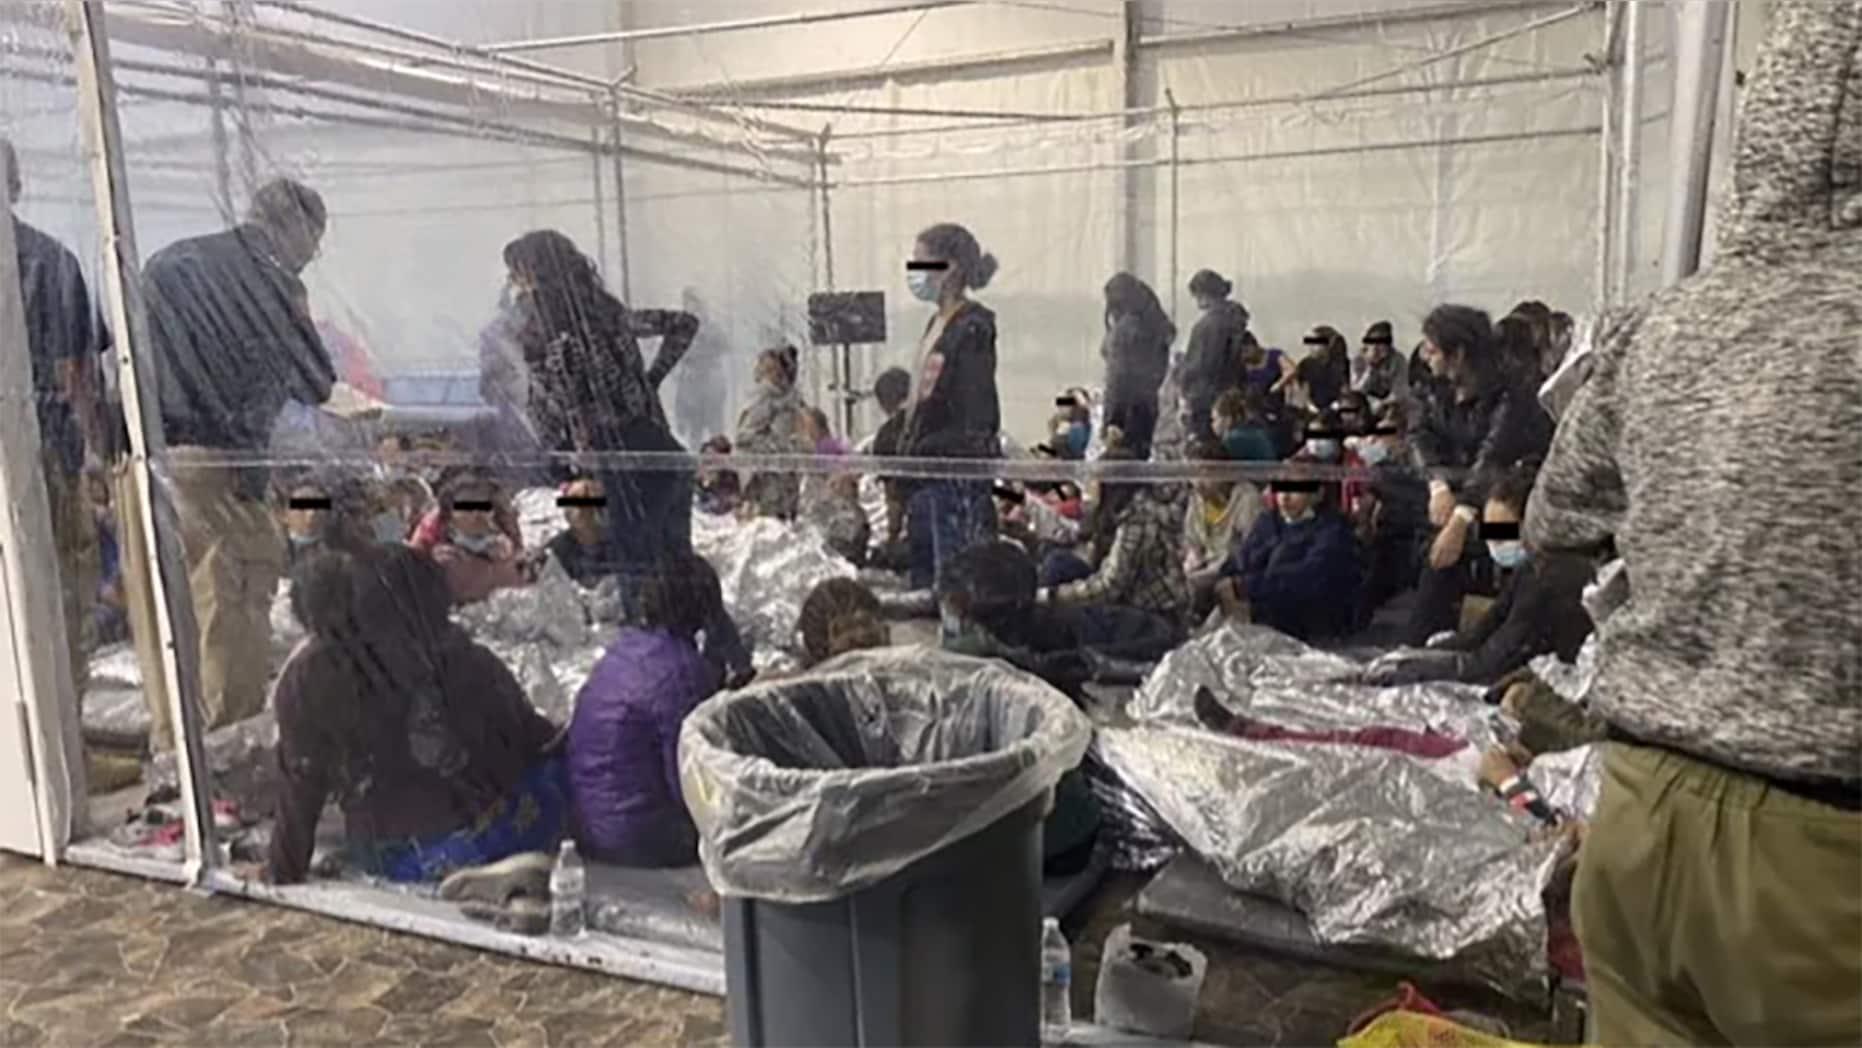 U.S. Border Crisis Deepens As VP Kamala Harris Is Nowhere To Be Found